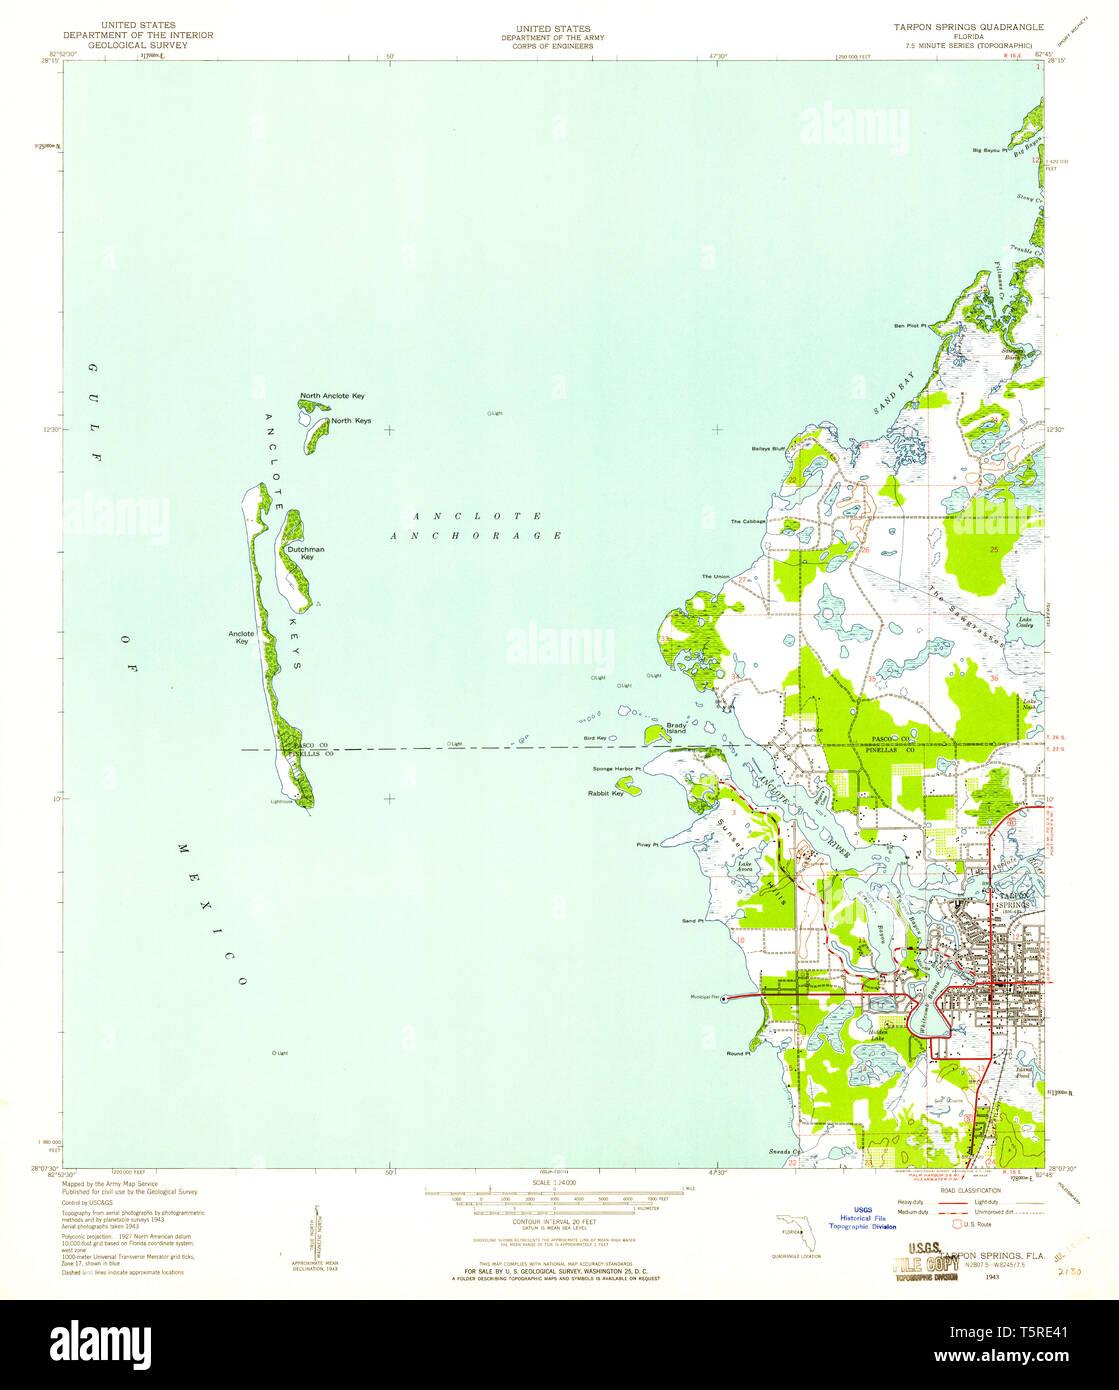 USGS TOPO Map Florida FL Tarpon Springs 348795 1943 24000 ... Map Of Tarpon Springs Fl on map of waterford mi, map of fenton mi, map of harrison township mi, map of kalamazoo mi, sunset tarpon springs fl, hospitals tarpon springs fl, map tampa fl, map florida fl, map of saratoga springs ny, map of new york counties, howard beach tarpon springs fl, map of downtown tarpon springs, santorini restaurant tarpon springs fl, map of longview tx, craig park tarpon springs fl, map of colorado springs, map of palm springs ca, map of florida,